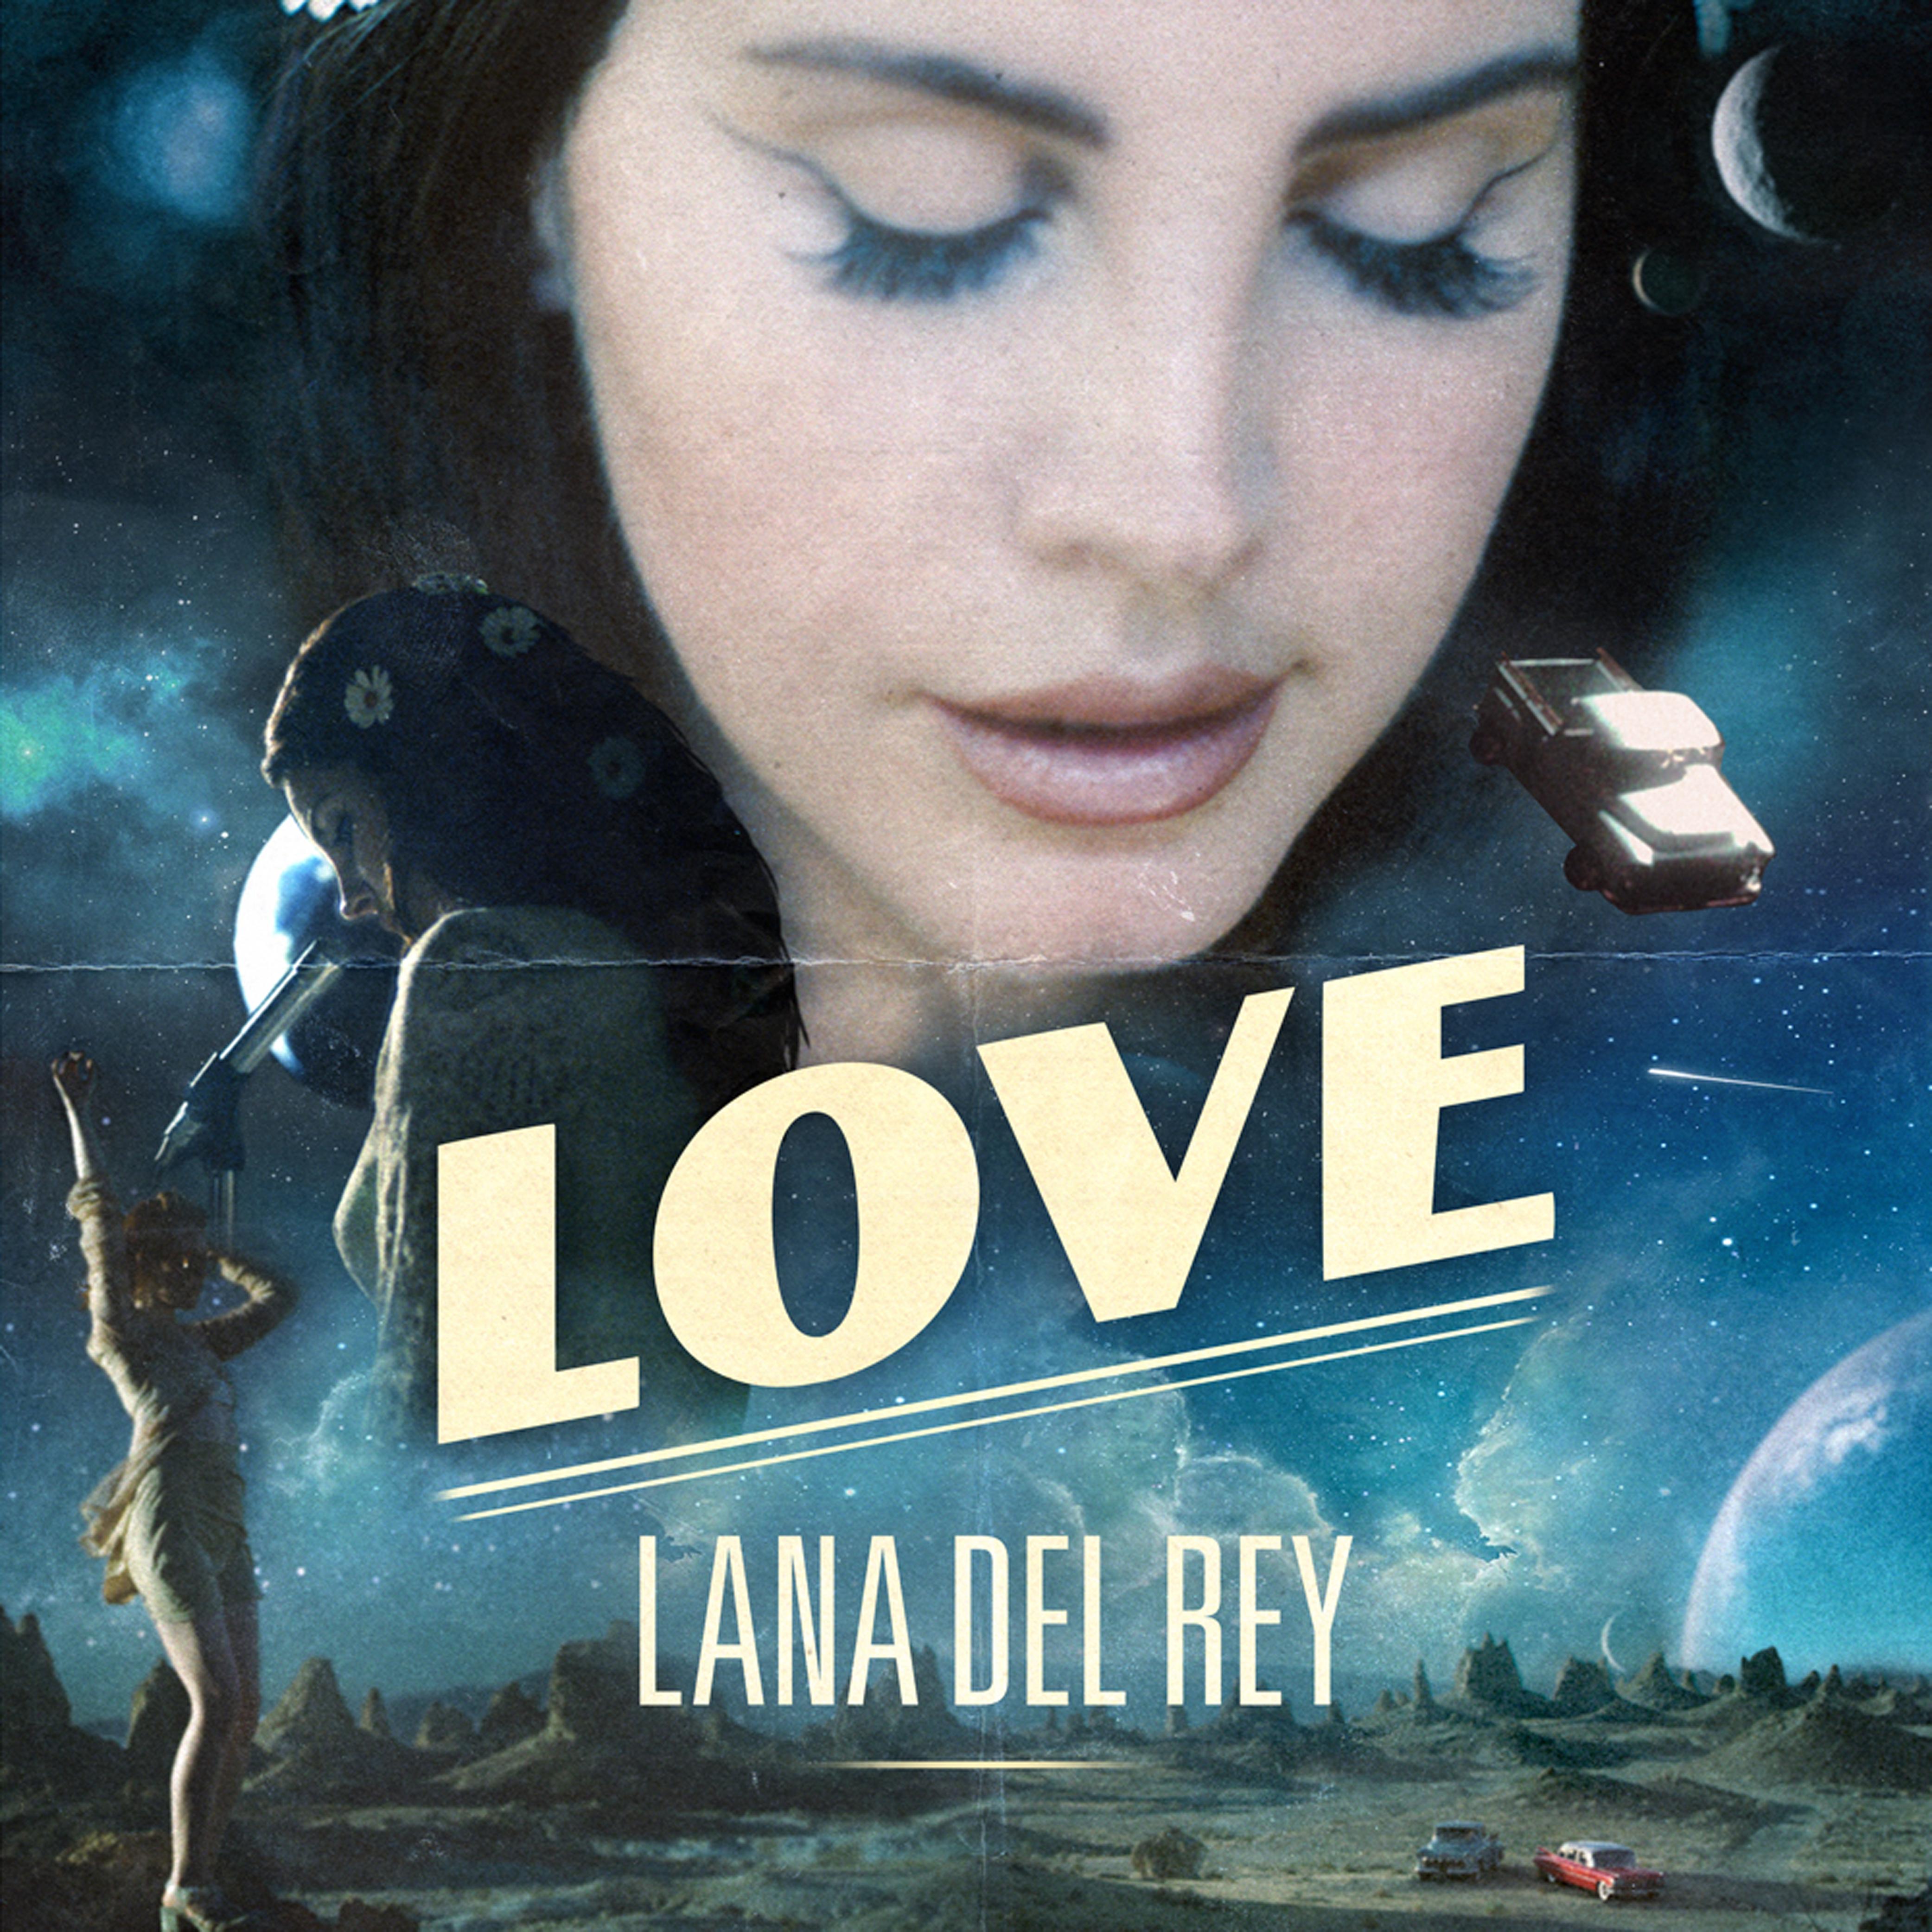 lana del rey download album free